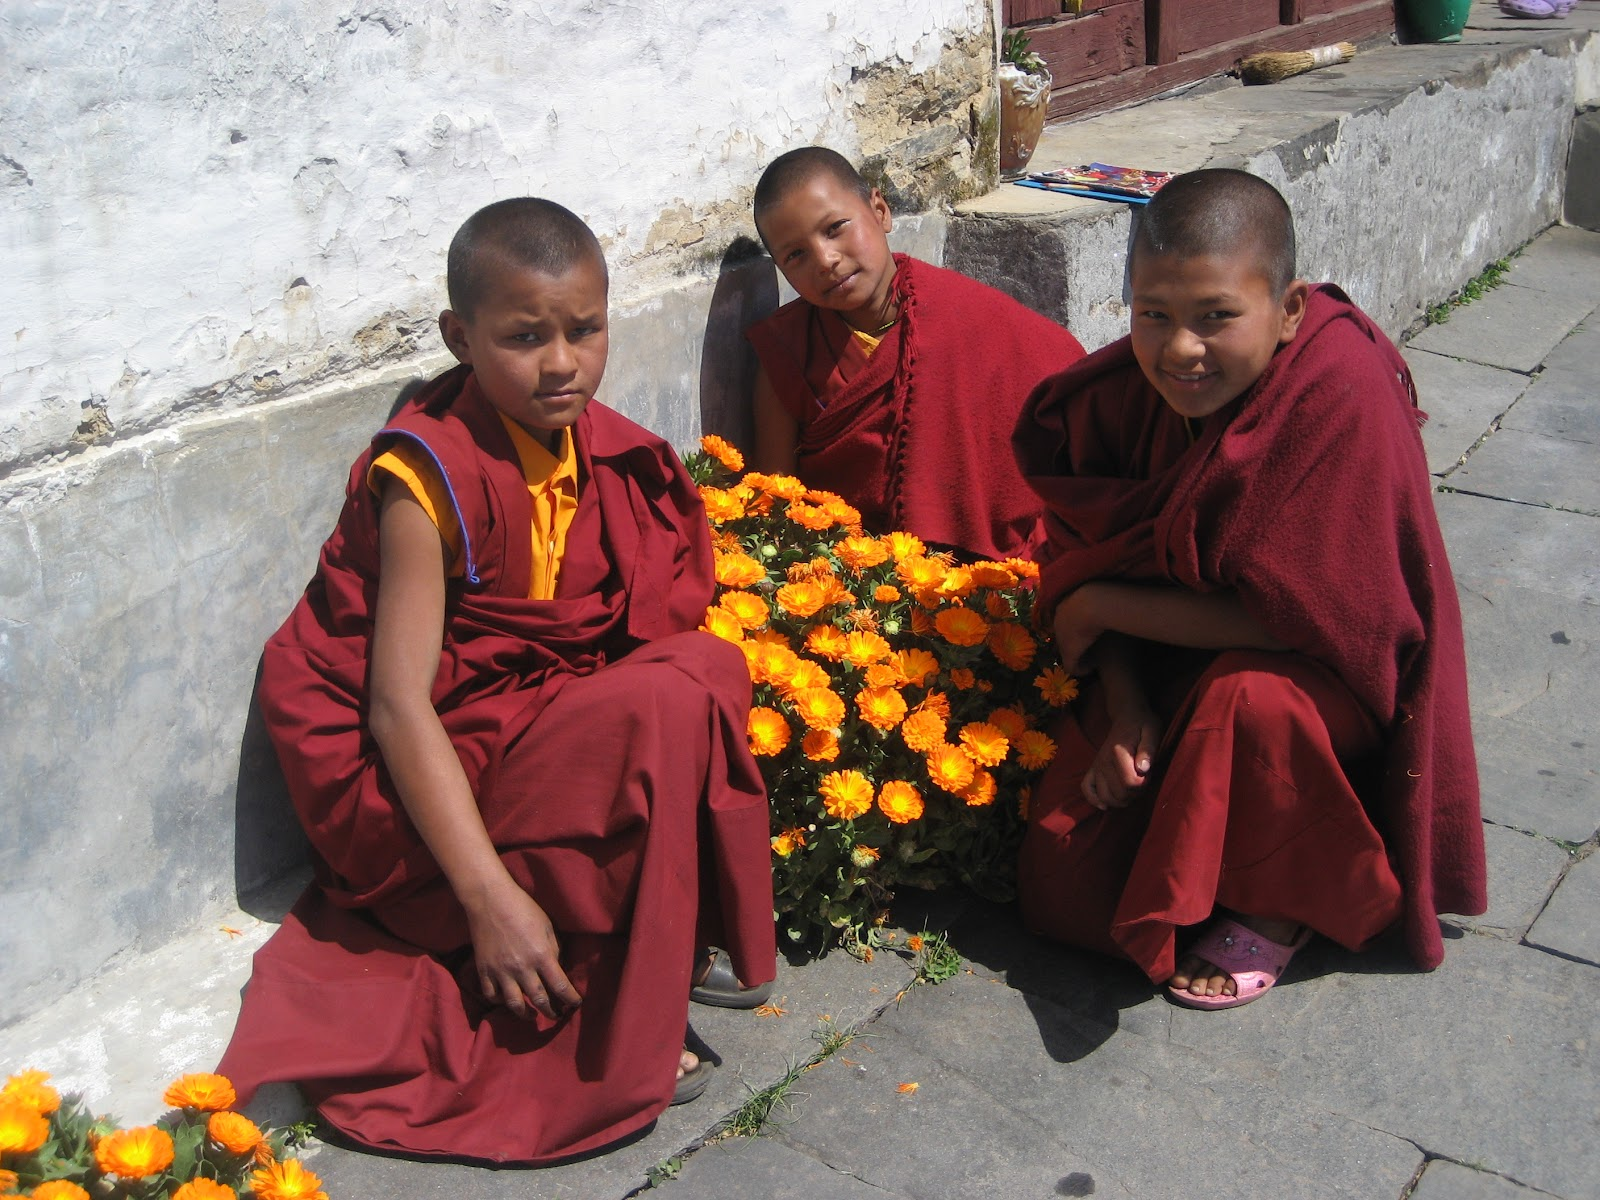 Young nuns from Bigu Nunnery